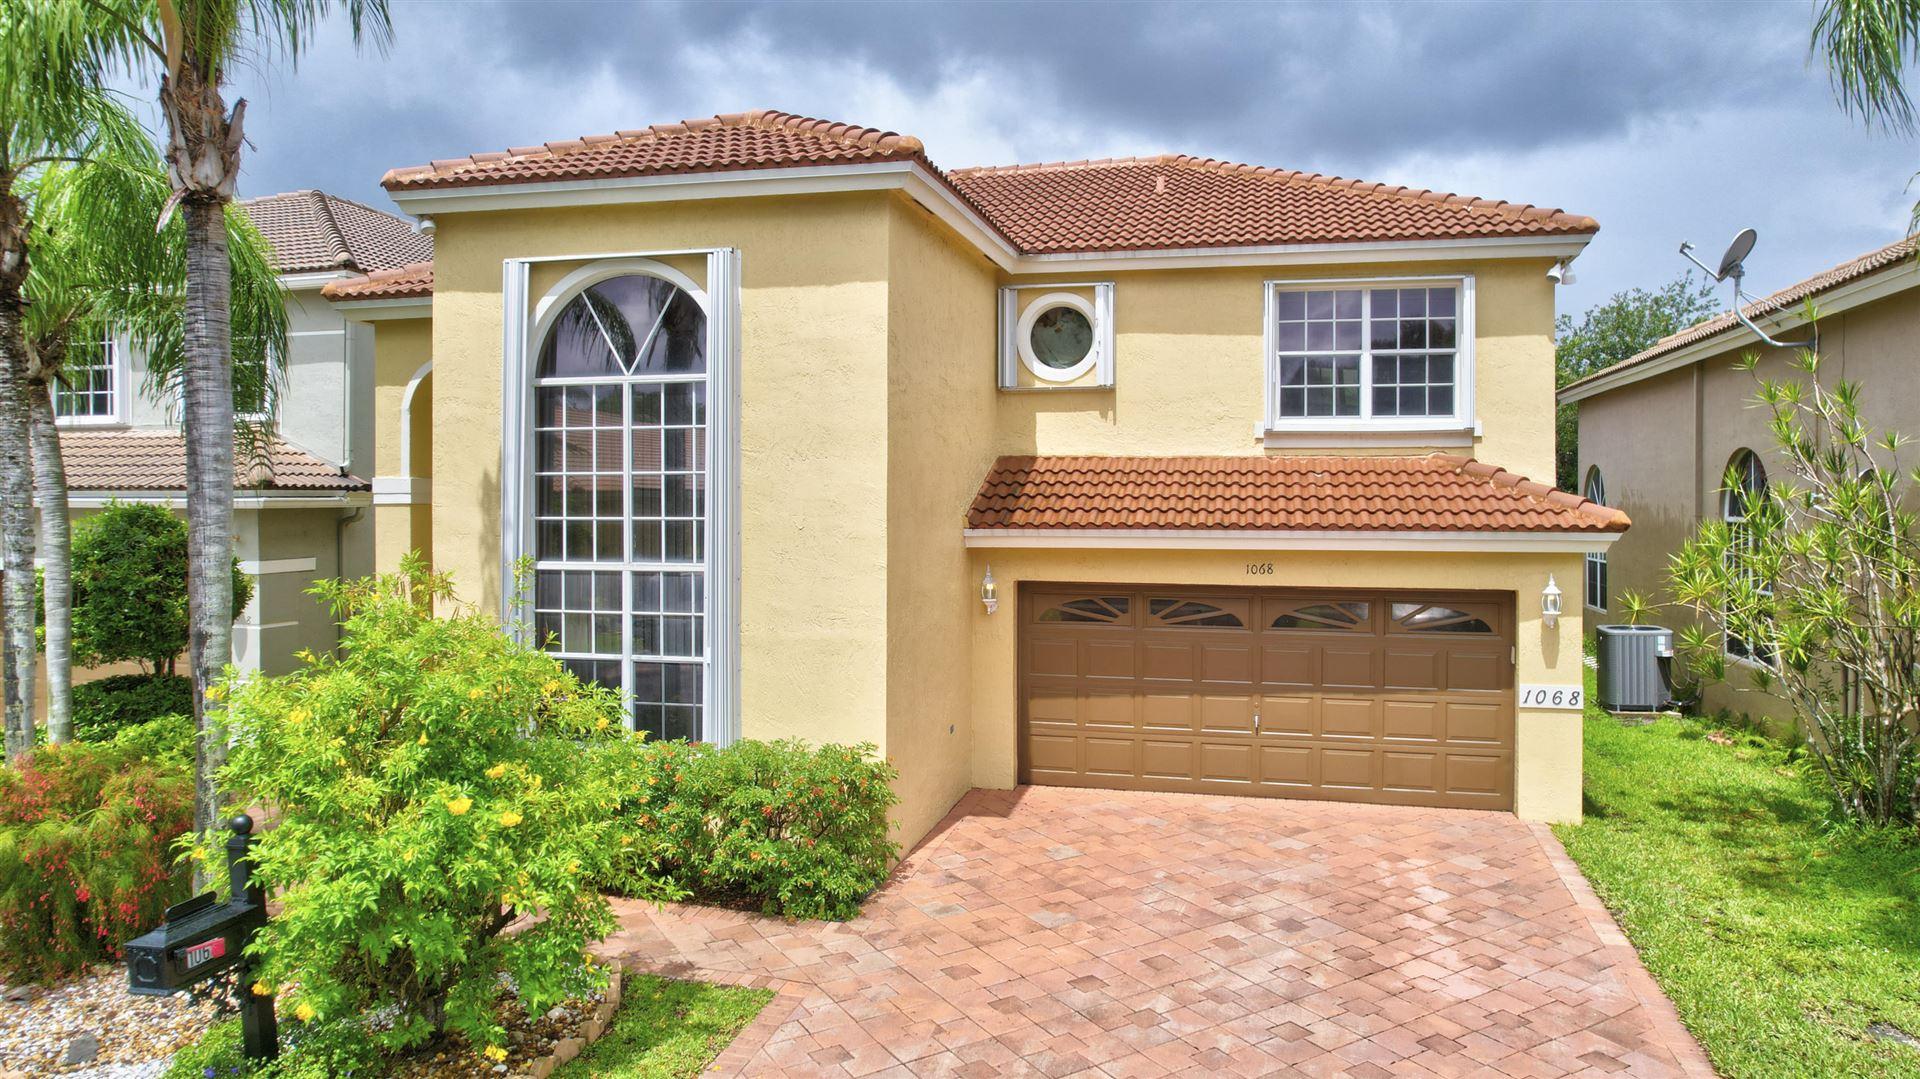 1068 NW 116 Avenue, Coral Springs, FL 33071 - MLS#: RX-10721373